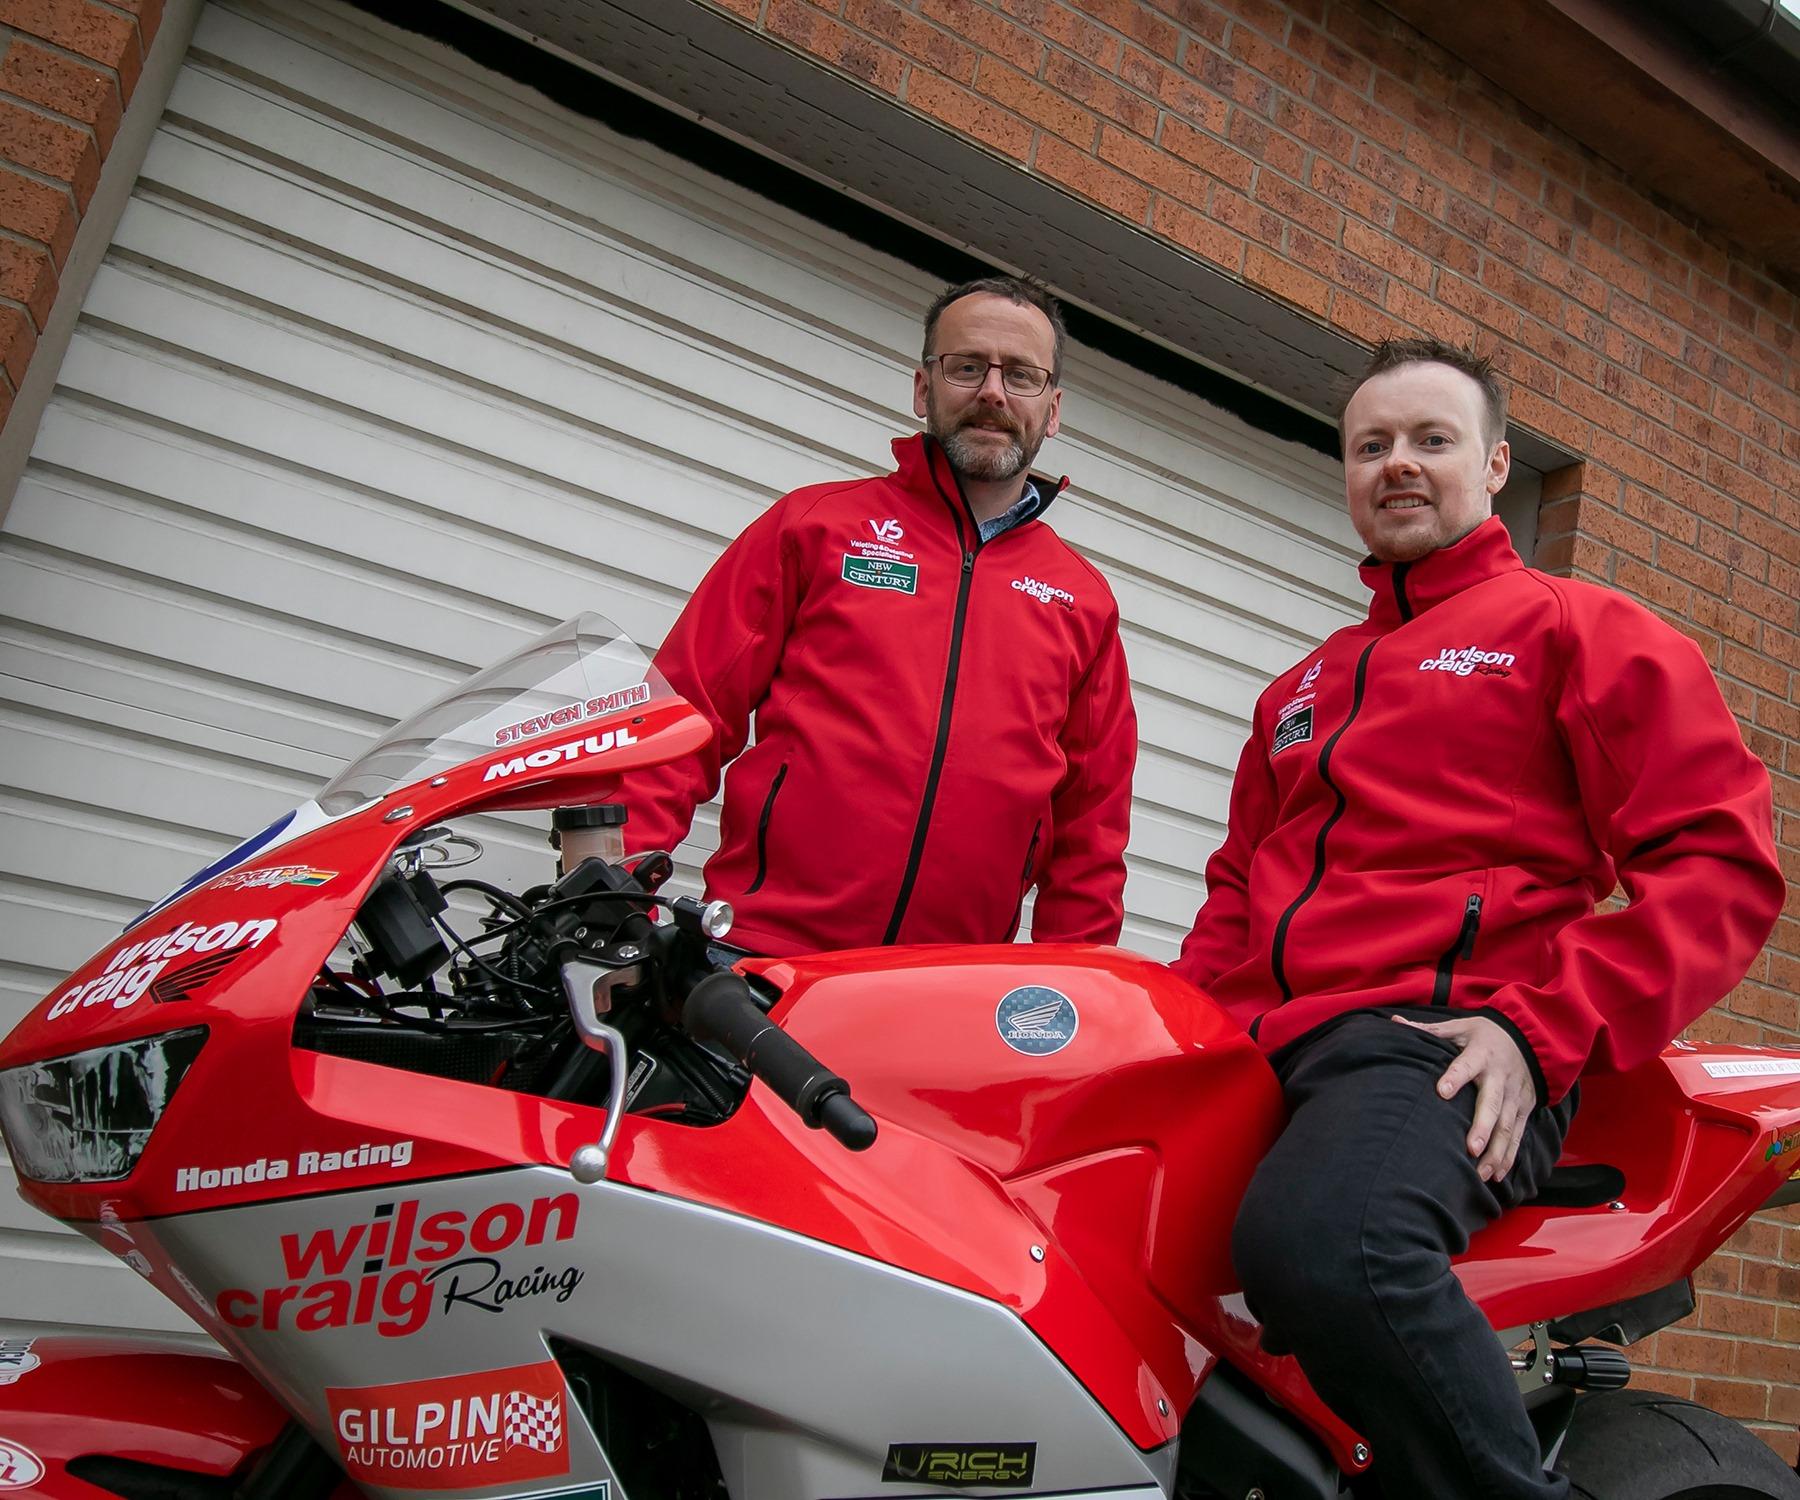 Wilson Craig Racing Announce Michelin Tie-Up, Confirm Smith For Next Season